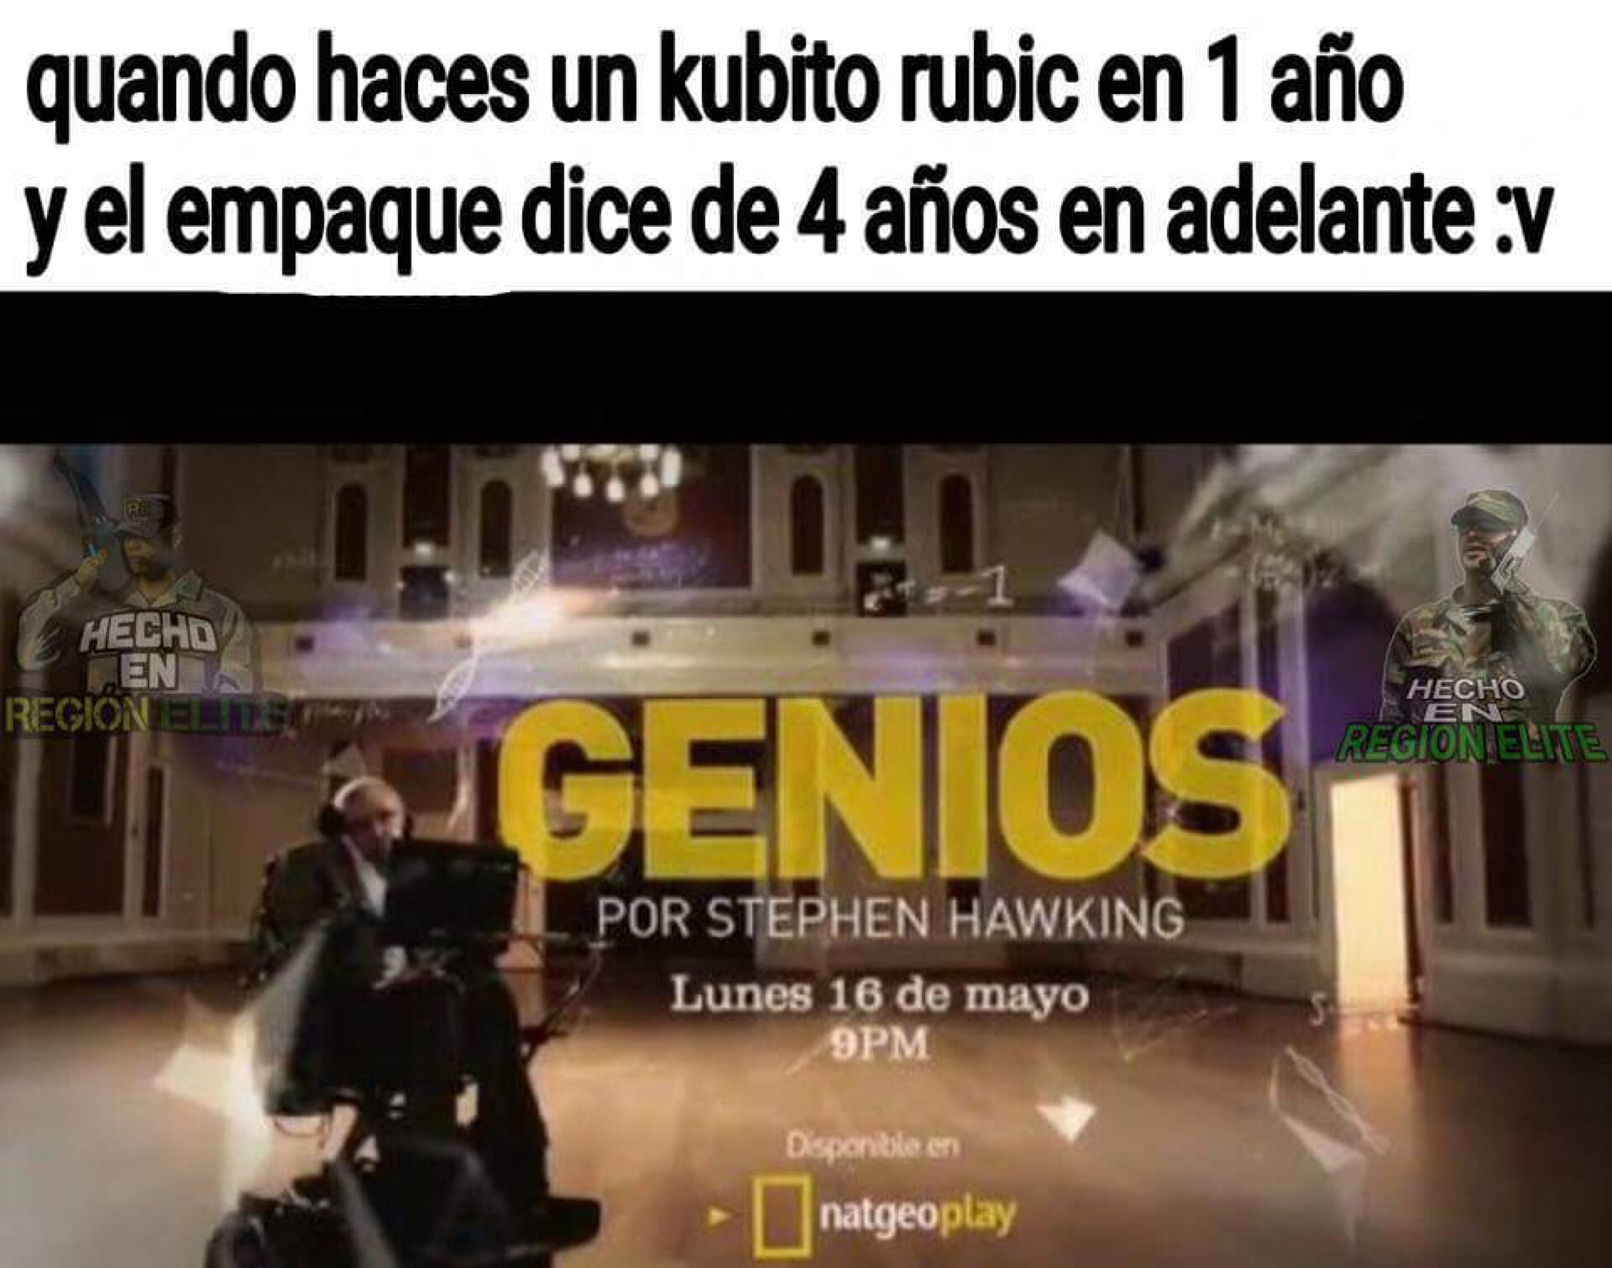 jenioz - meme